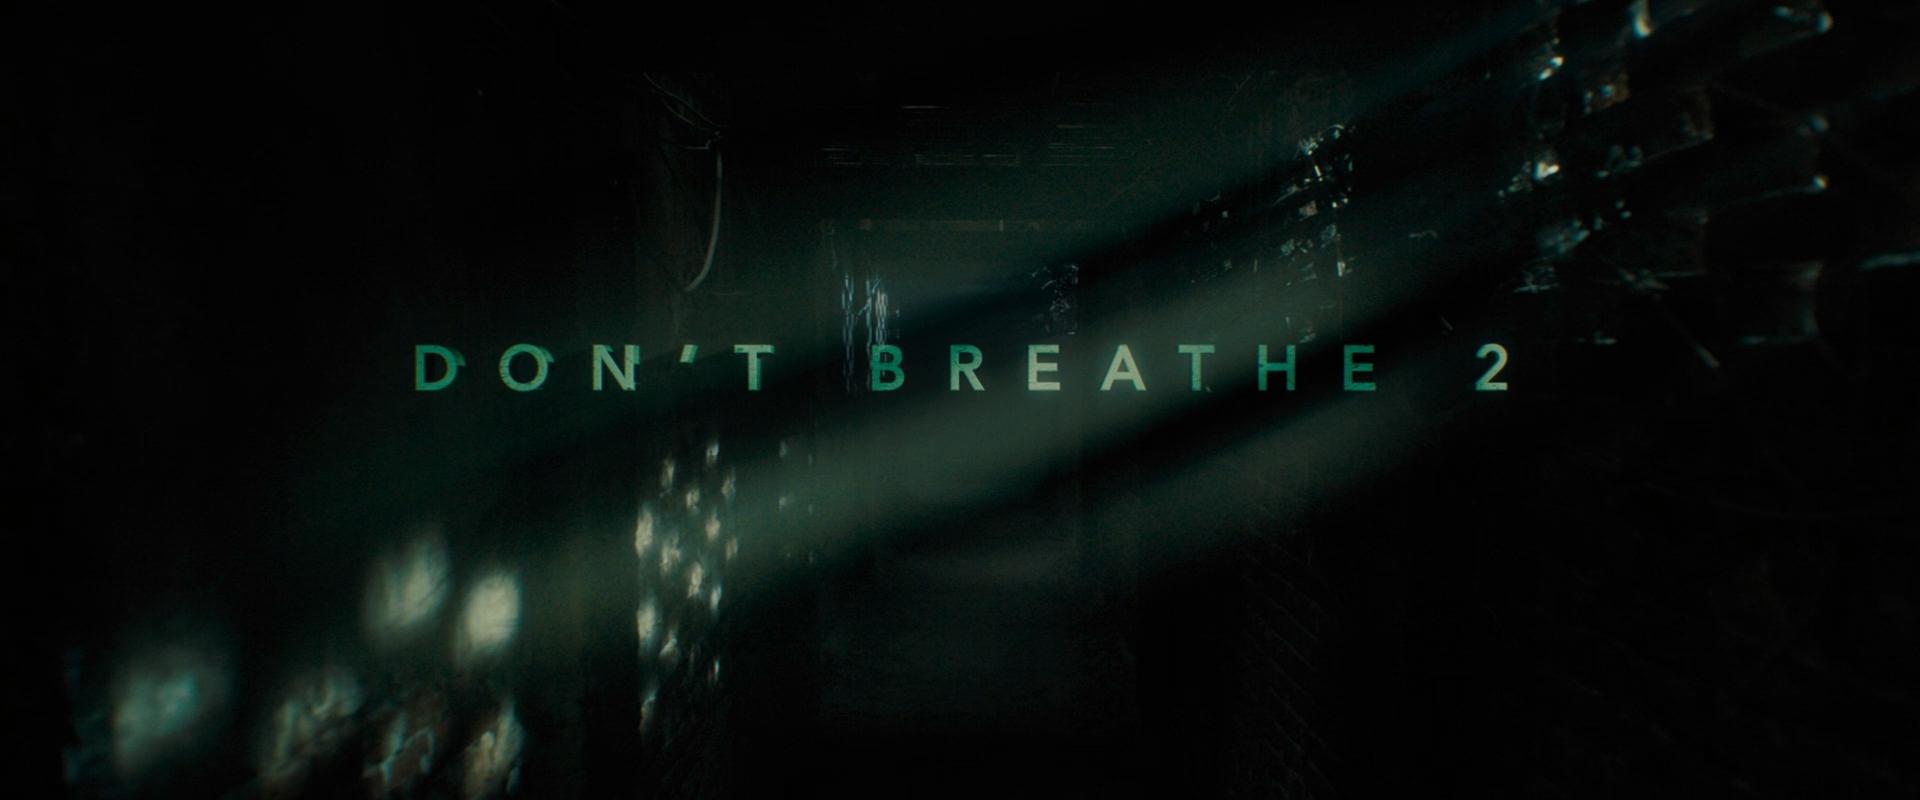 No respires 2 (2021) 1080p WEB-DL AMZN Latino